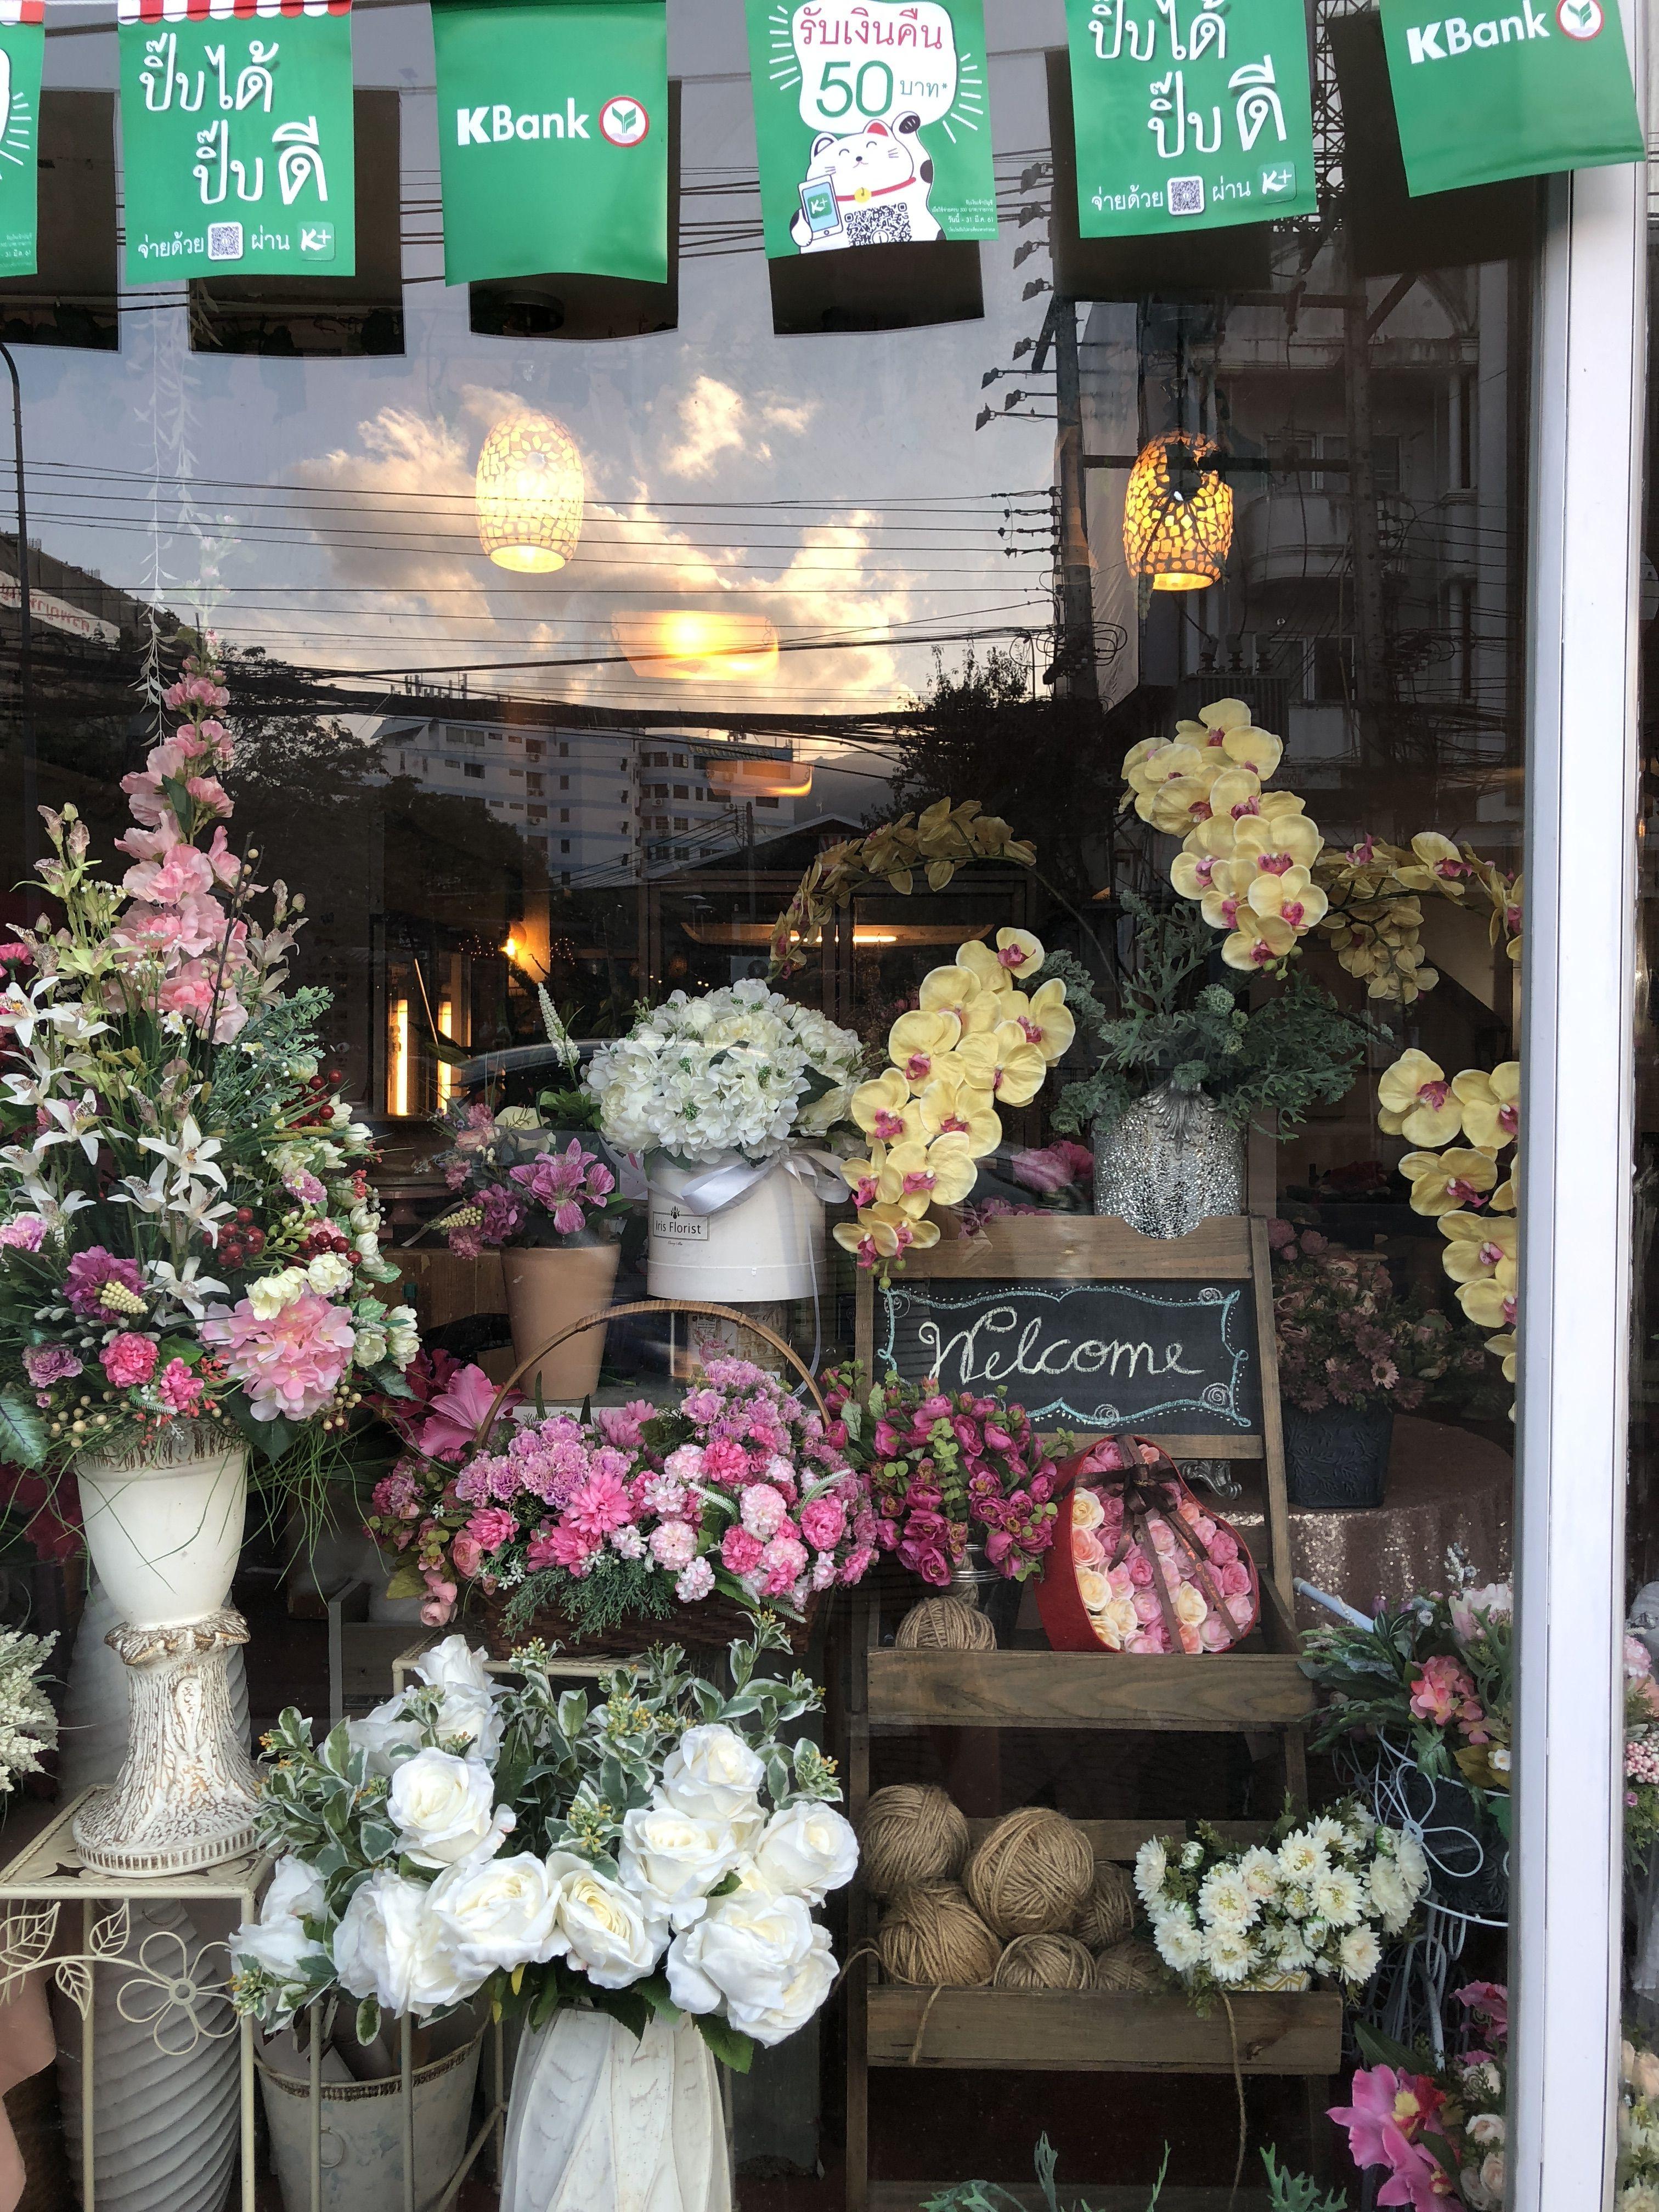 Iris florist window display 2017 florist pinterest florist iris florist window display 2017 izmirmasajfo